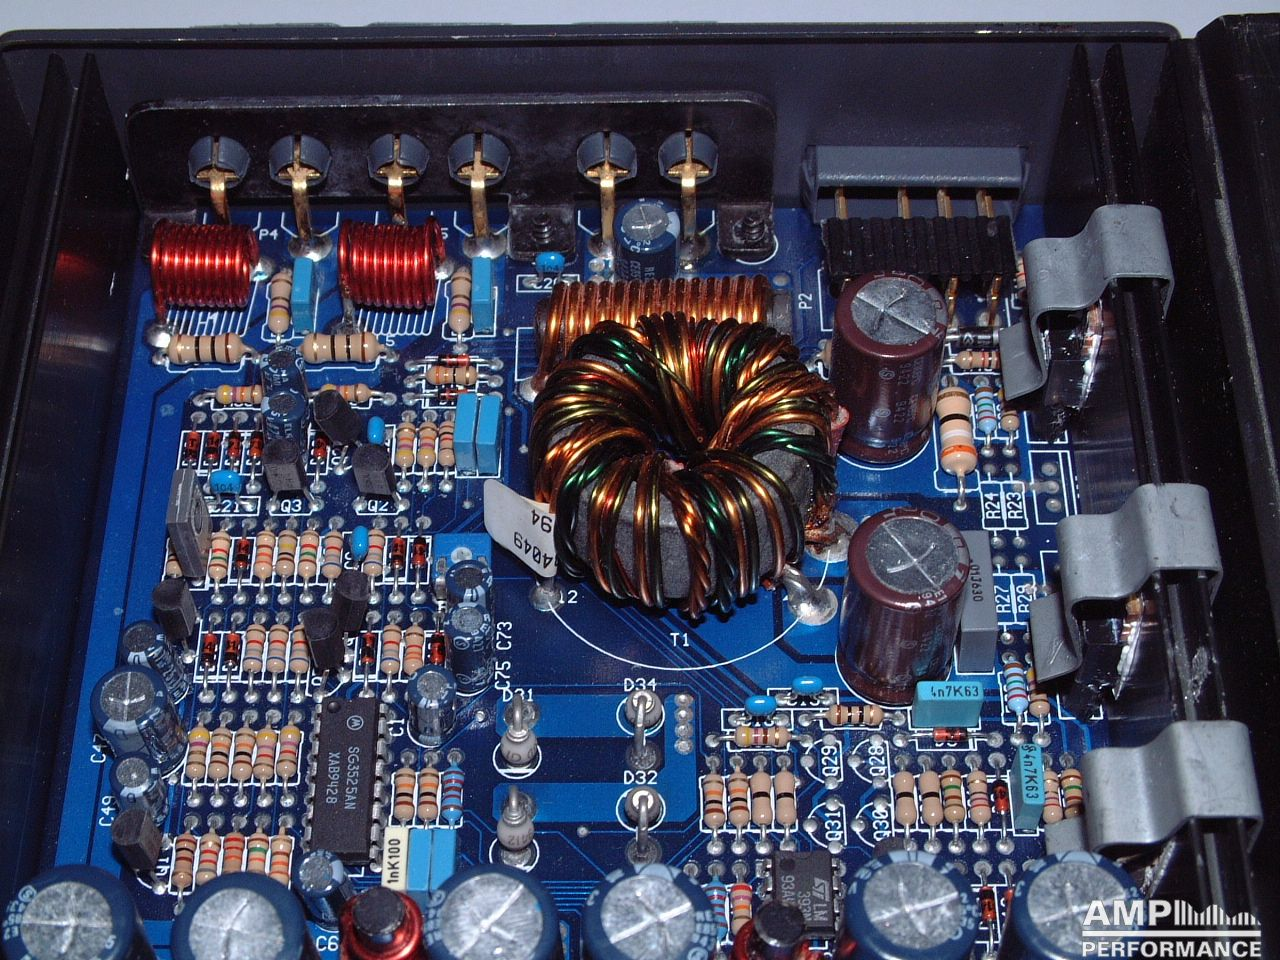 Audison Lr 3062 Amp Performance The Series Circuit Electronics Prevnext